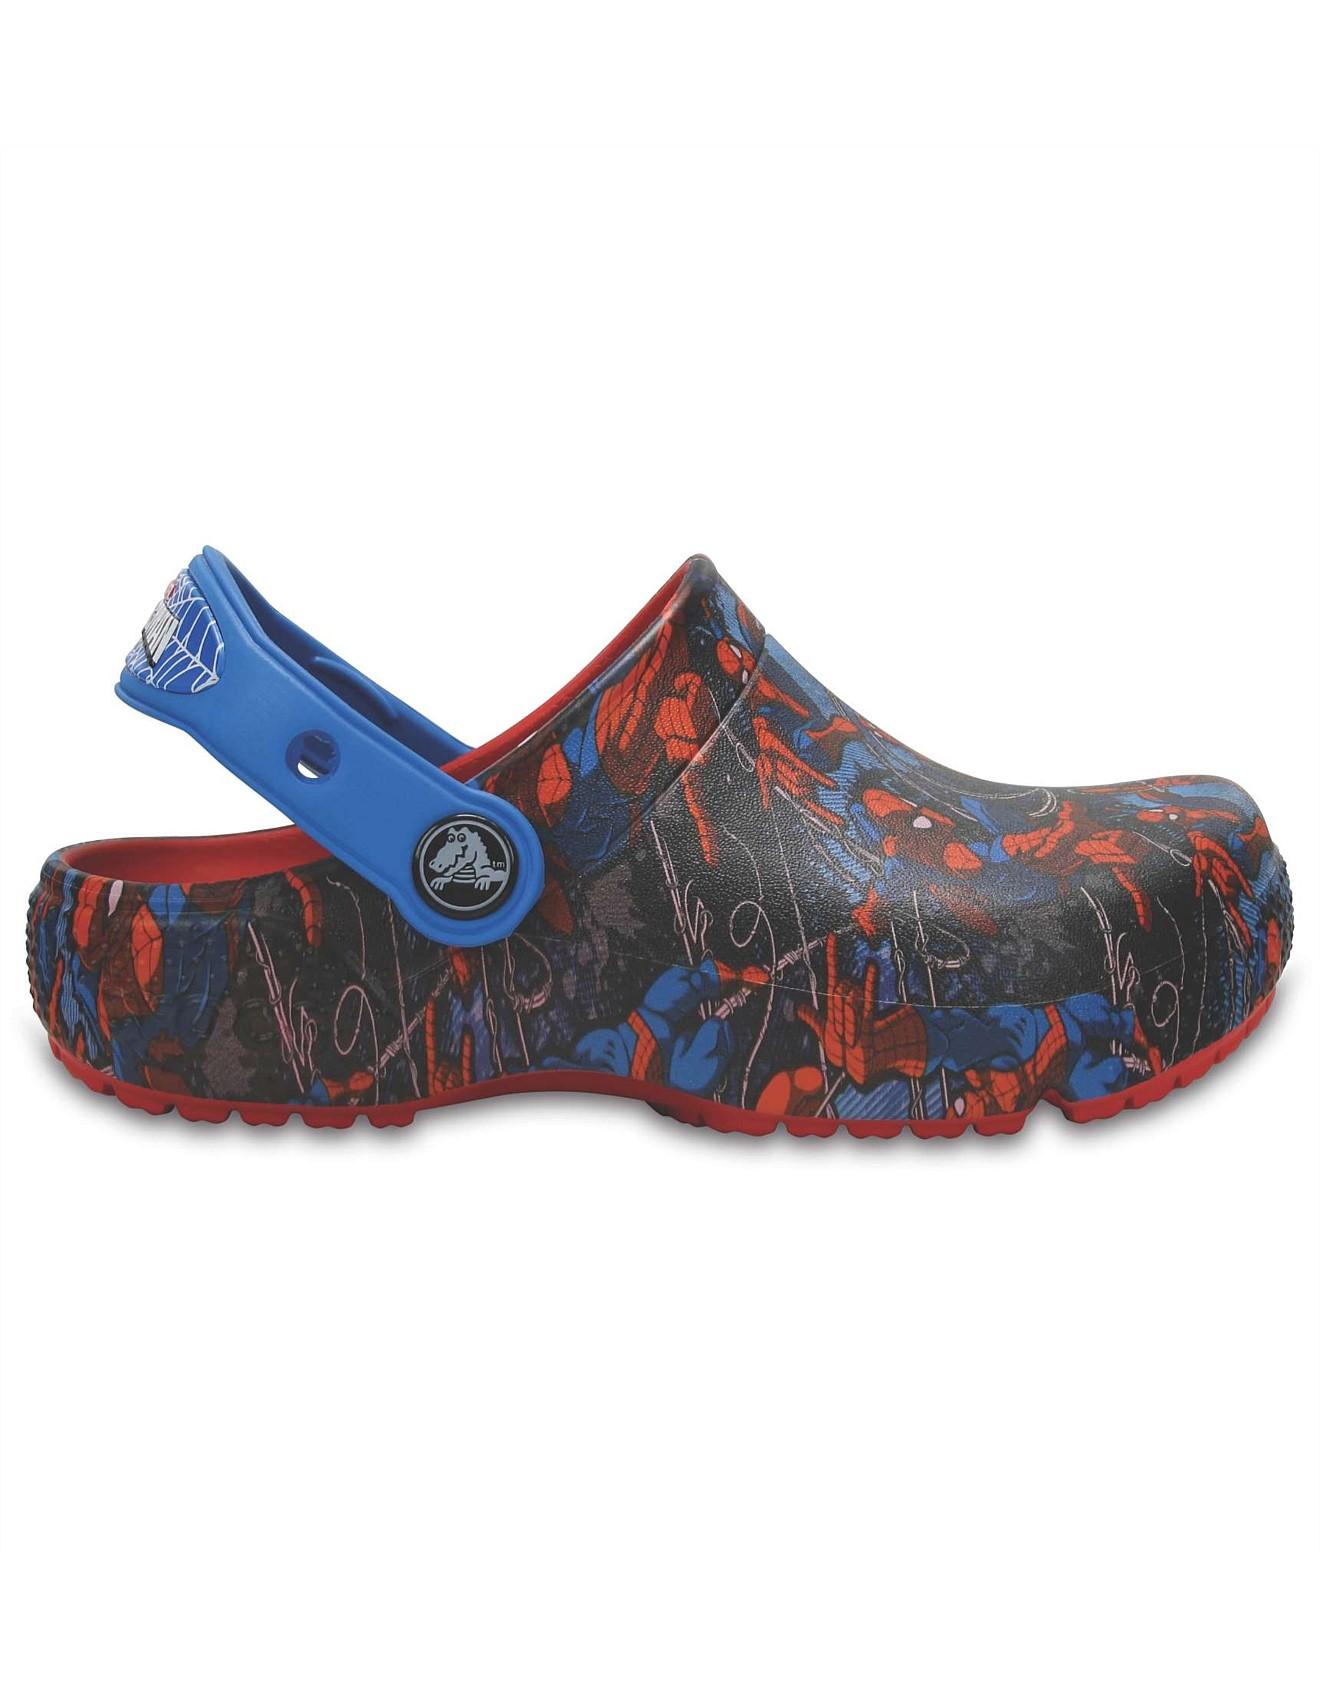 27eb2941669c Crocsfunlab Spiderman Flame. Zoom. Crocs